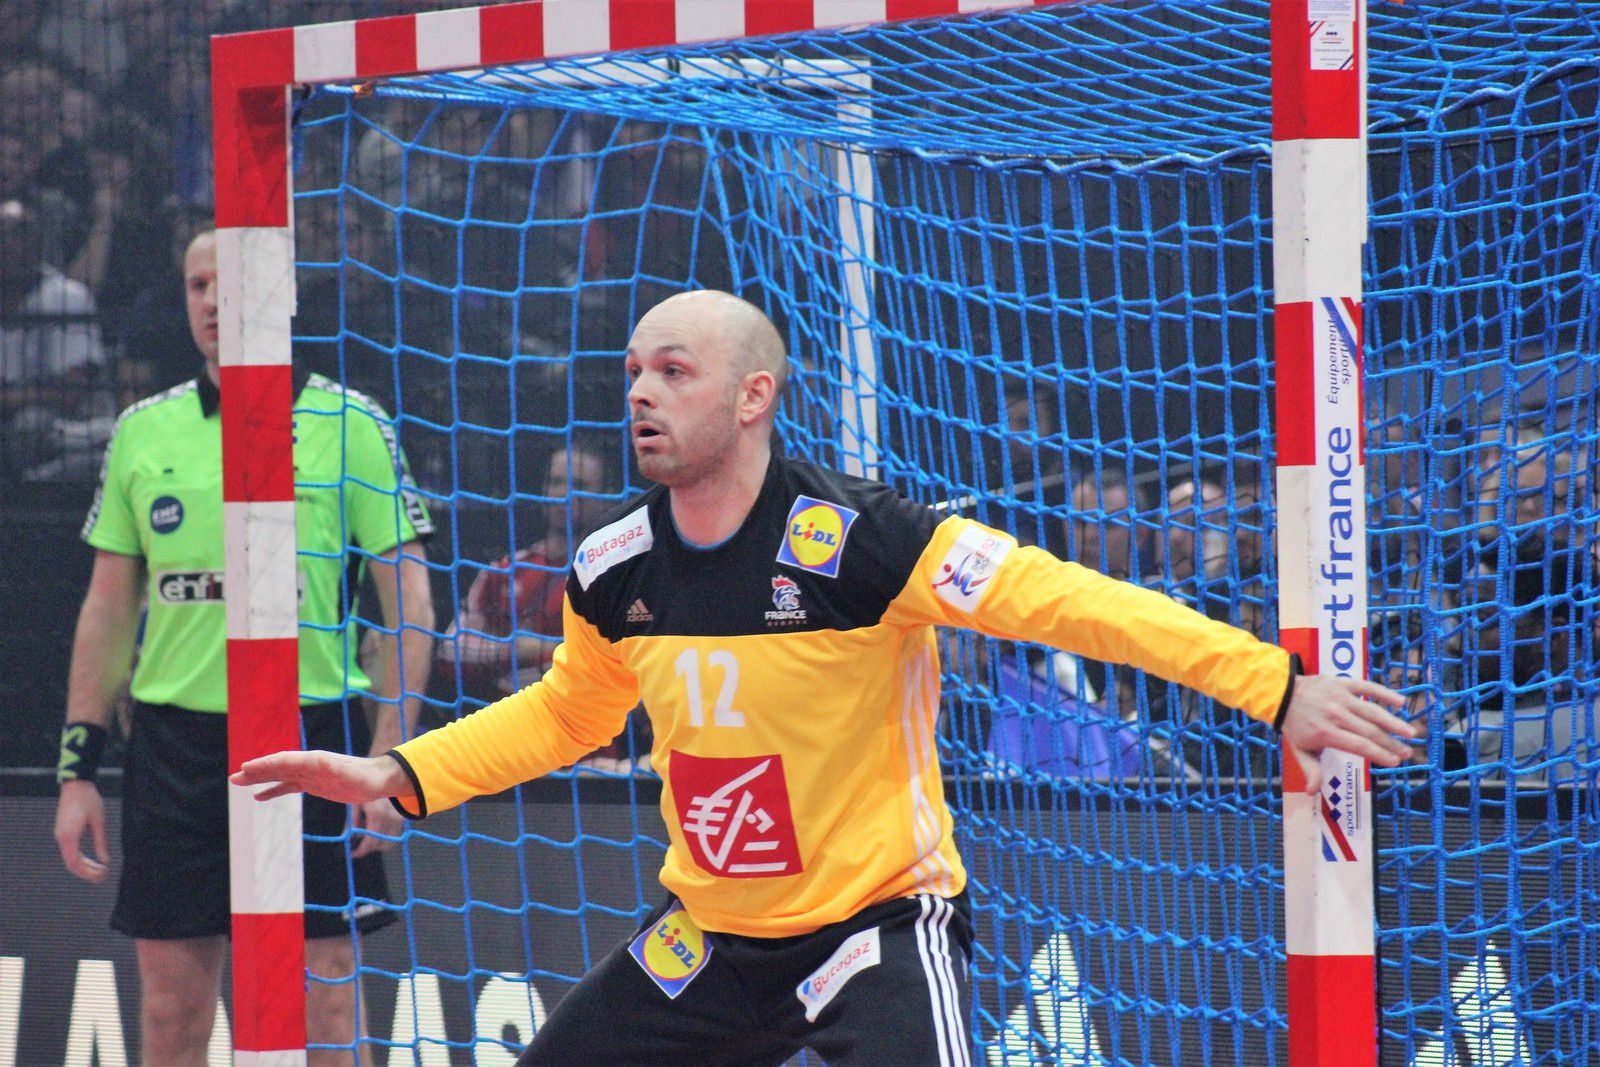 Golden League 2018 (AHA 07.01.2018) 2/2